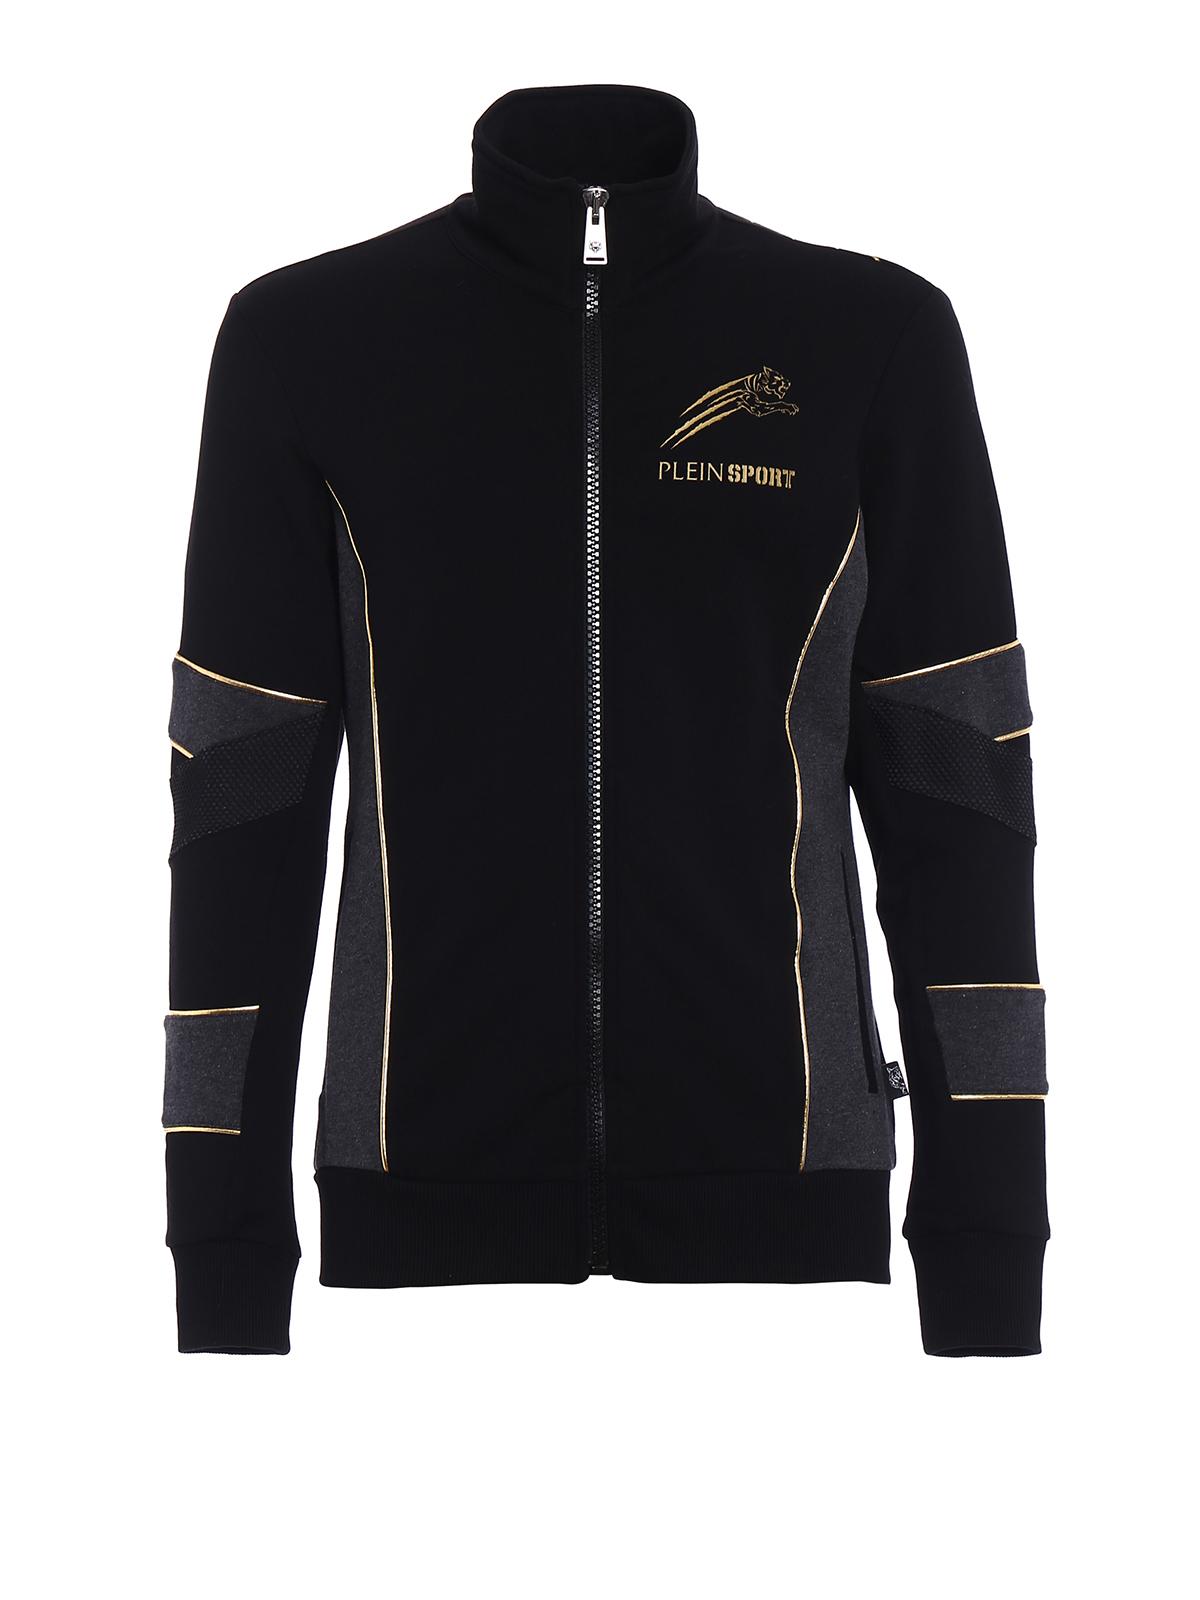 gold cotton sweat jacket by philipp plein sweatshirts sweaters ikrix. Black Bedroom Furniture Sets. Home Design Ideas